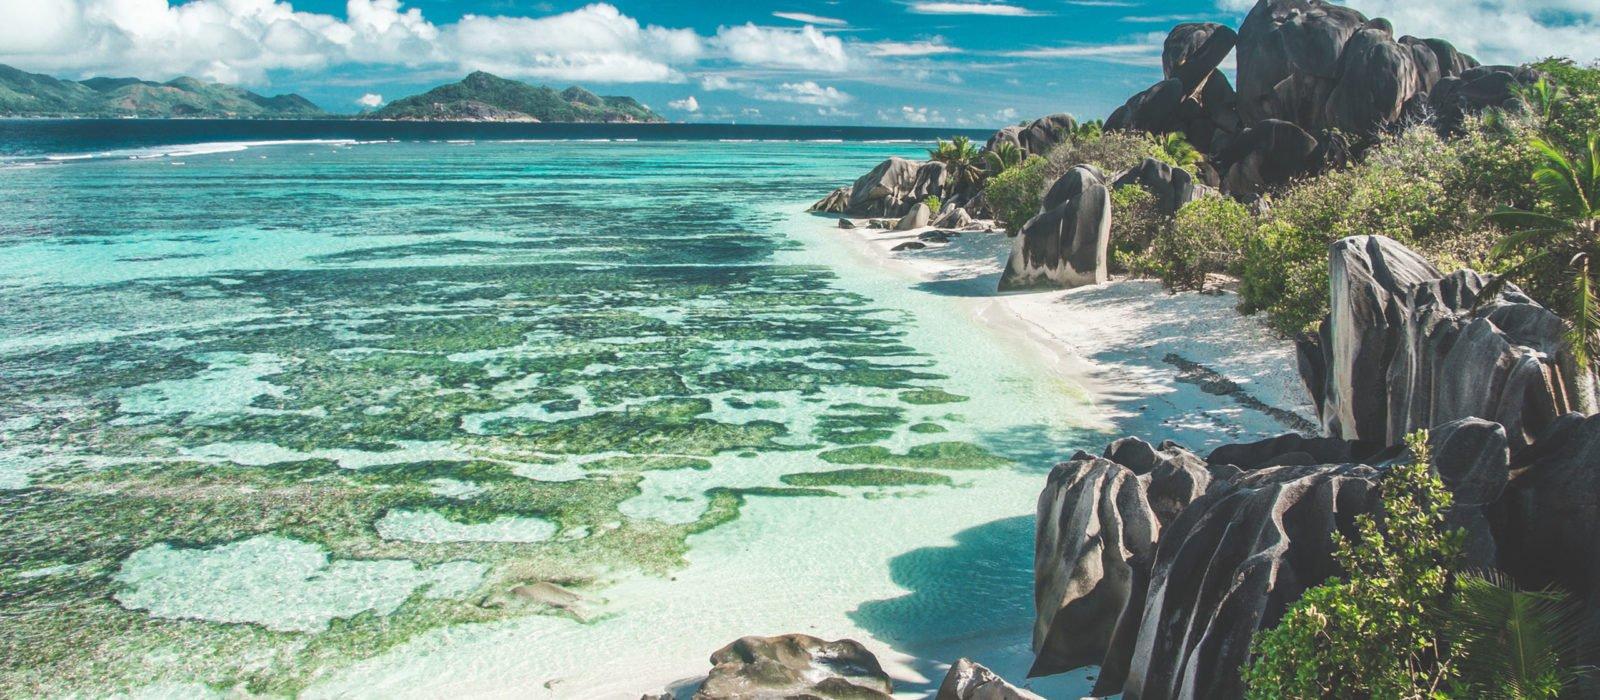 Paradise Island, Seychelles, Africa